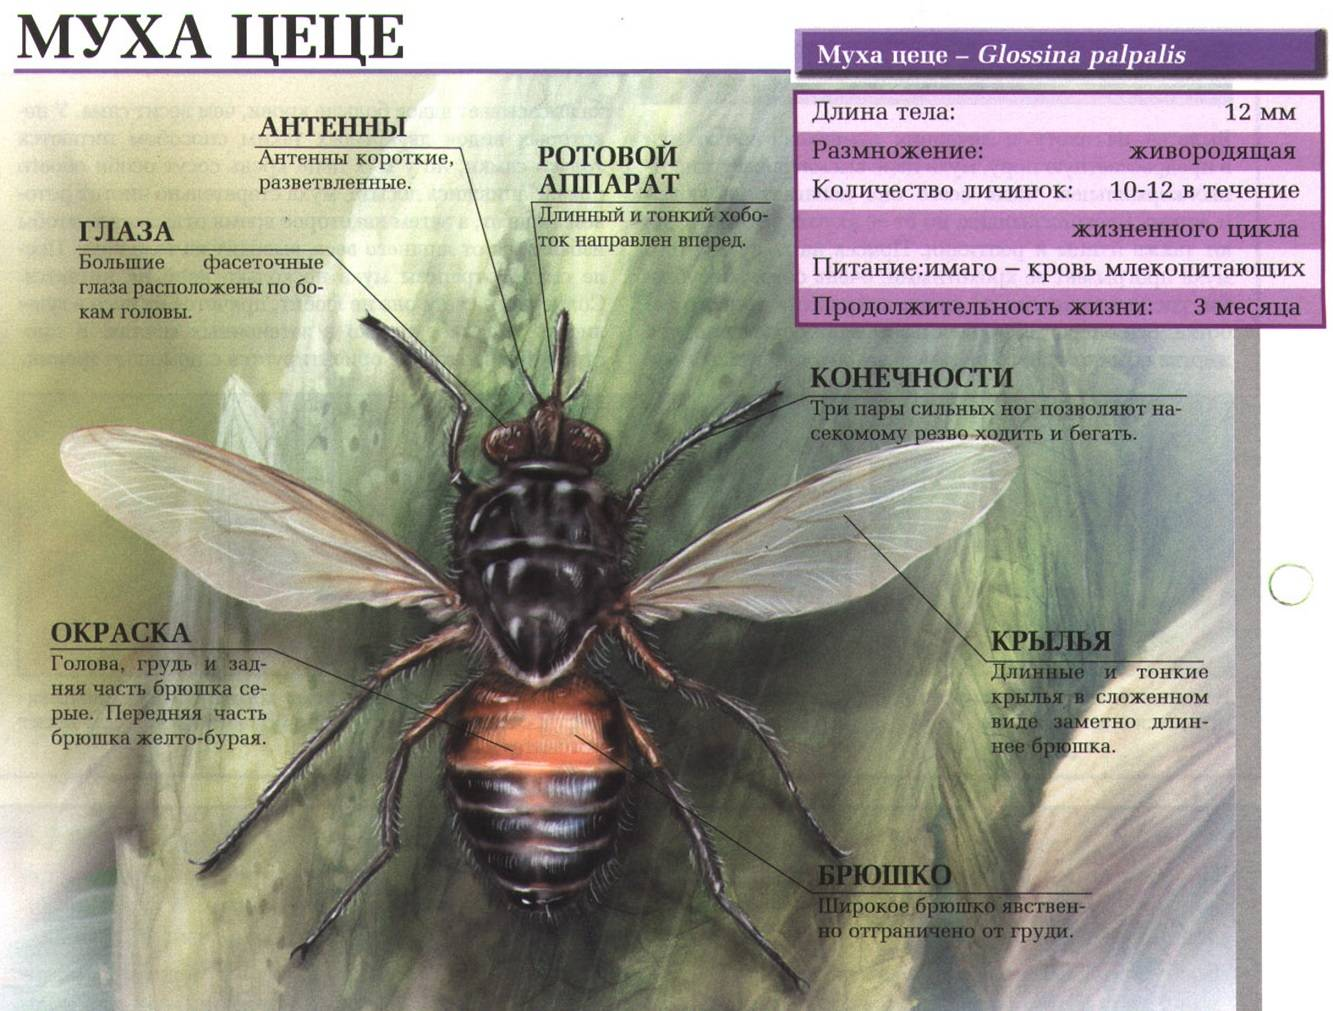 Муха цеце почему так называется. как выглядит муха цц. борьба с опасностью